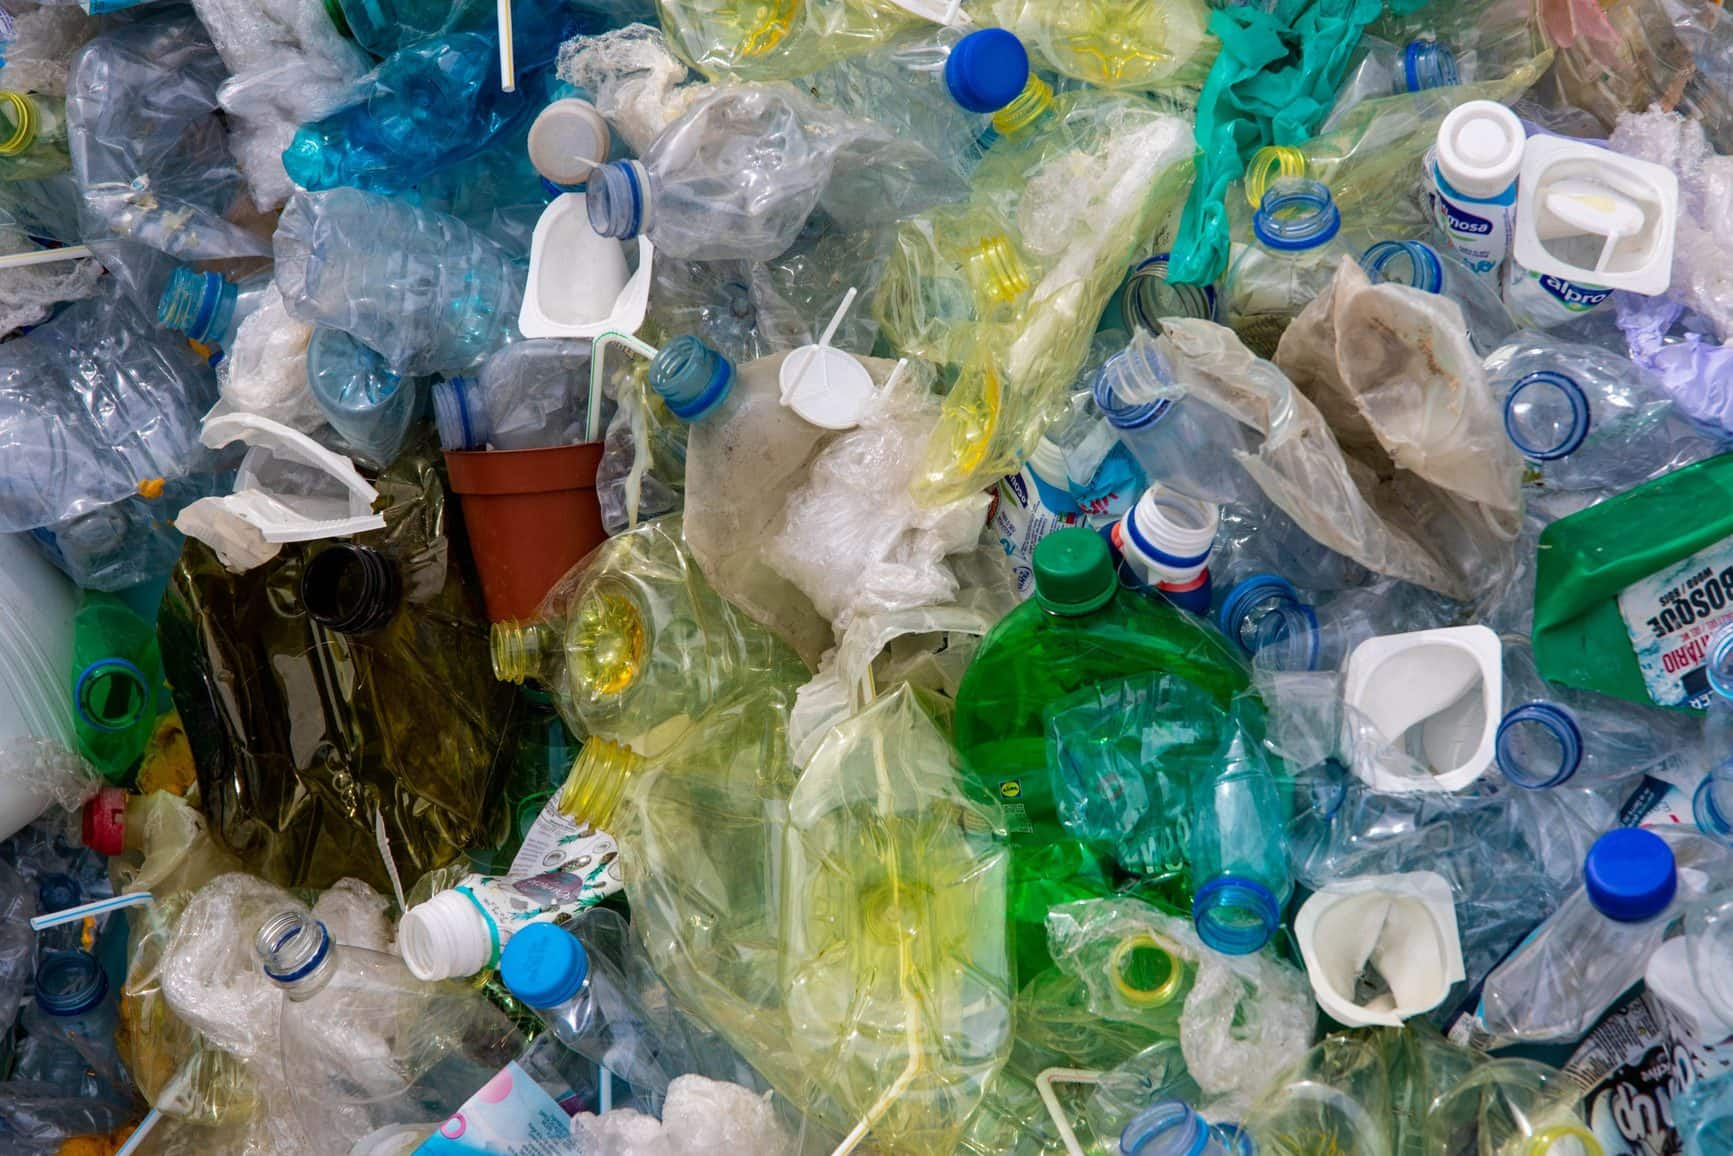 Trik Cepat Untuk Mengurangi Jumlah Plastik Dalam Kemasan